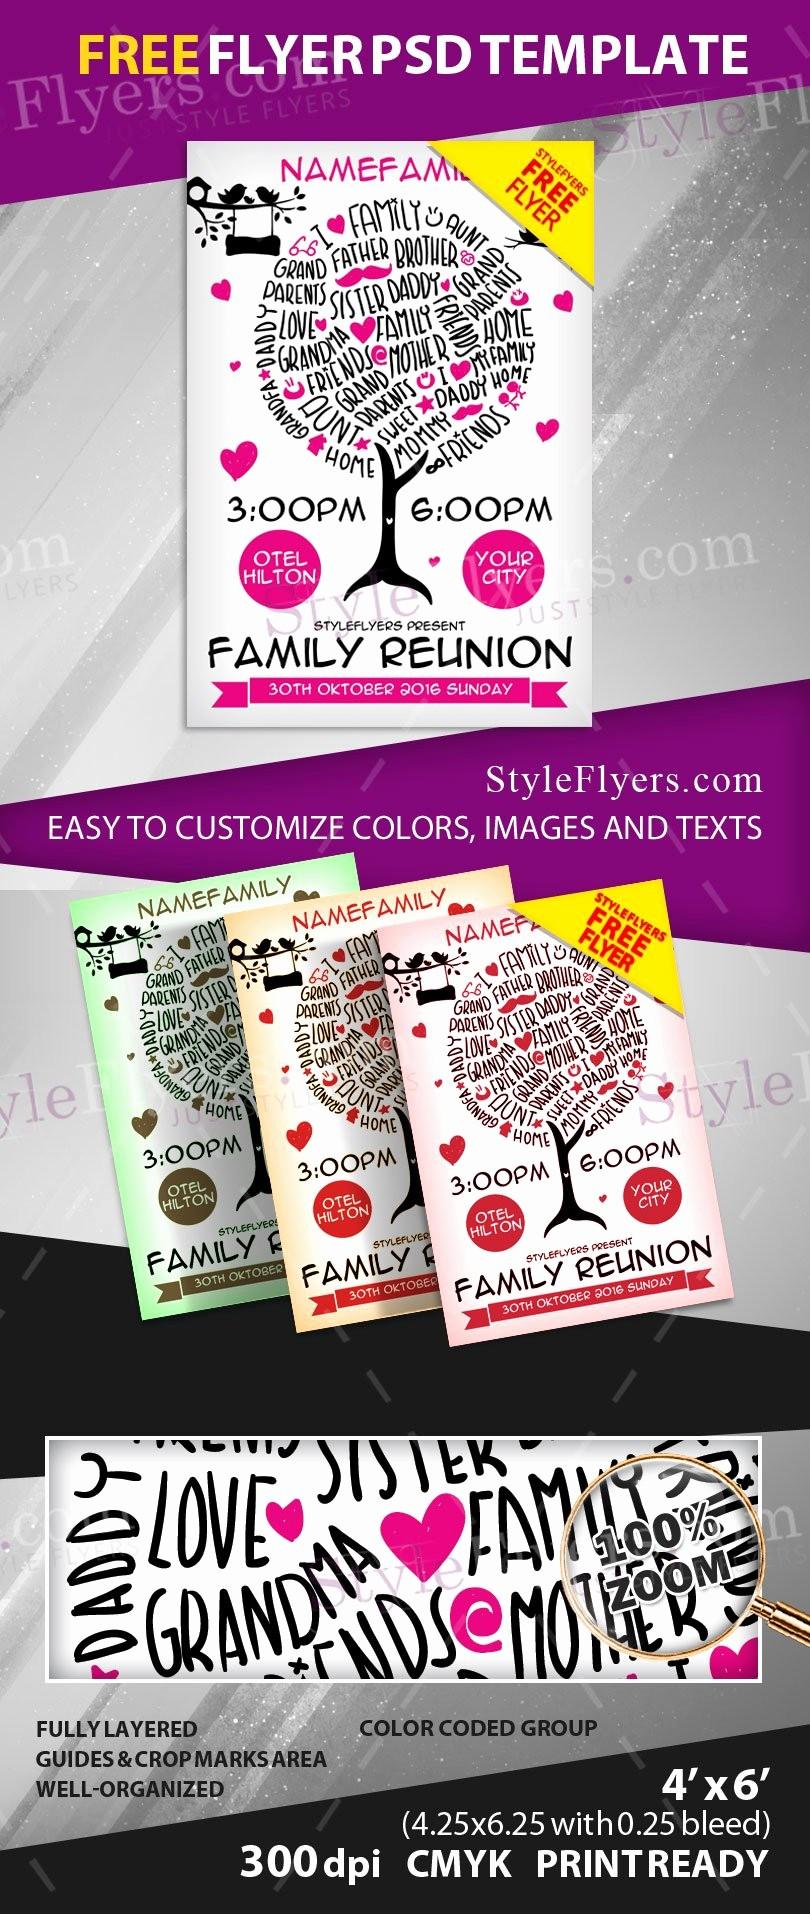 Free Family Reunion Flyers Templates Luxury Family Reunion Free Psd Flyer Template Free Download